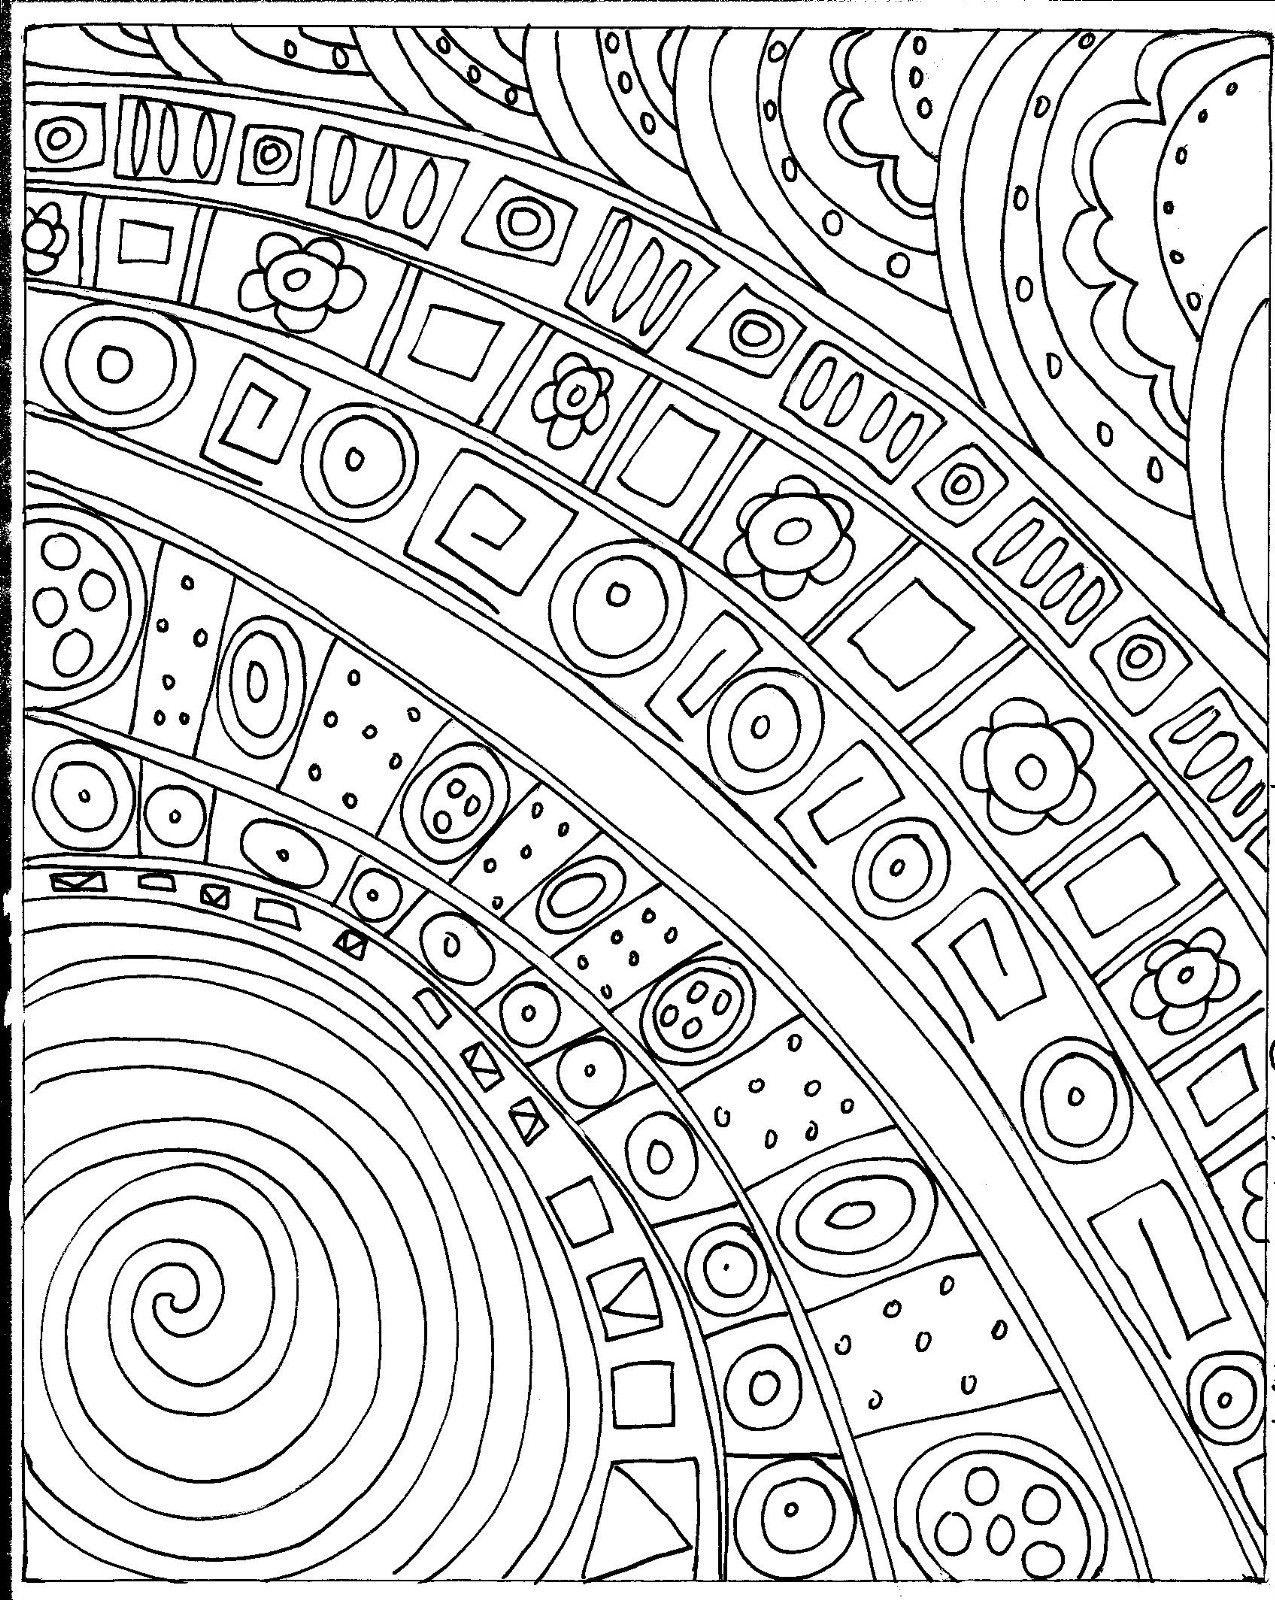 Rug Hooking Paper Pattern Carnival Abstract Folk Art